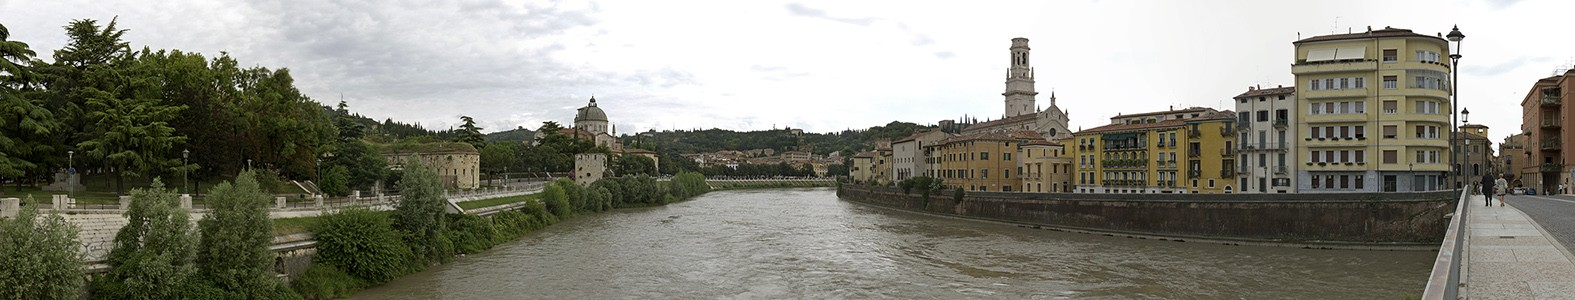 Verona Centro Storico (Altstadt): Blick von der Ponte Garibaldi Duomo Cattedrale di Santa Maria Matricolare Etsch San Giorgio in Braida